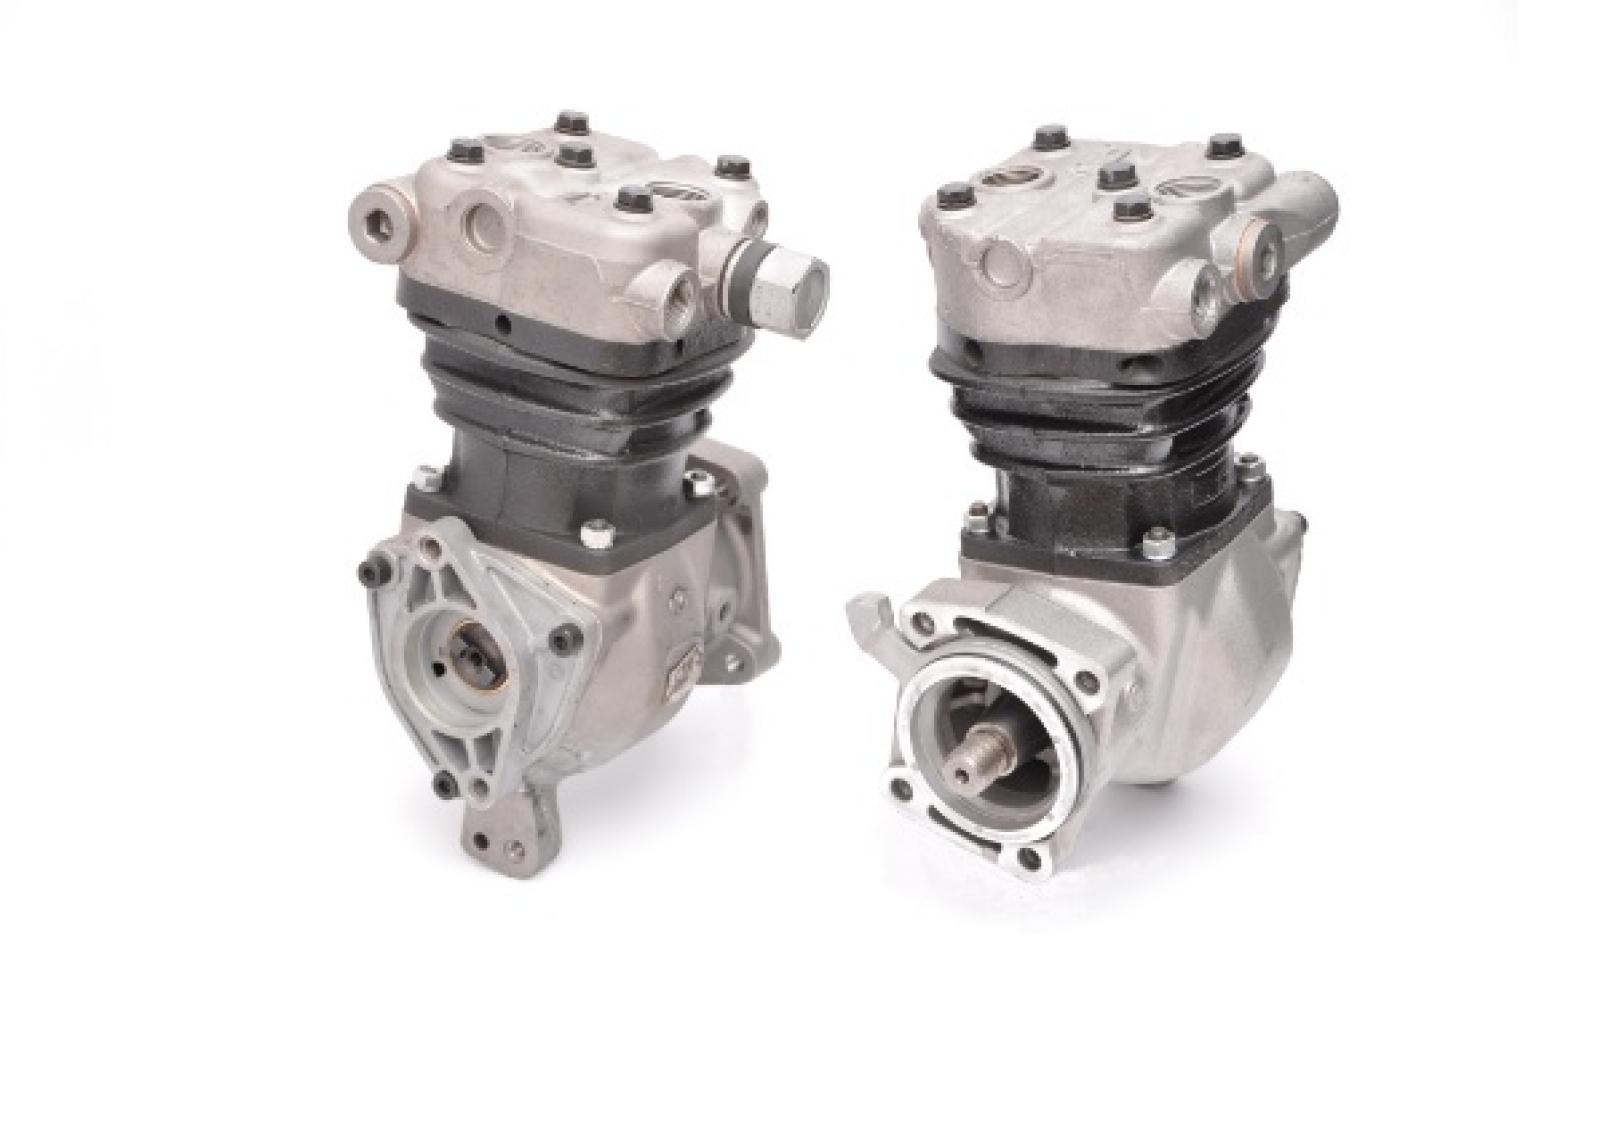 Air Compressor for Man, I94064, LK3927, 51541017201, 51541017247, 51541017205, I94064000